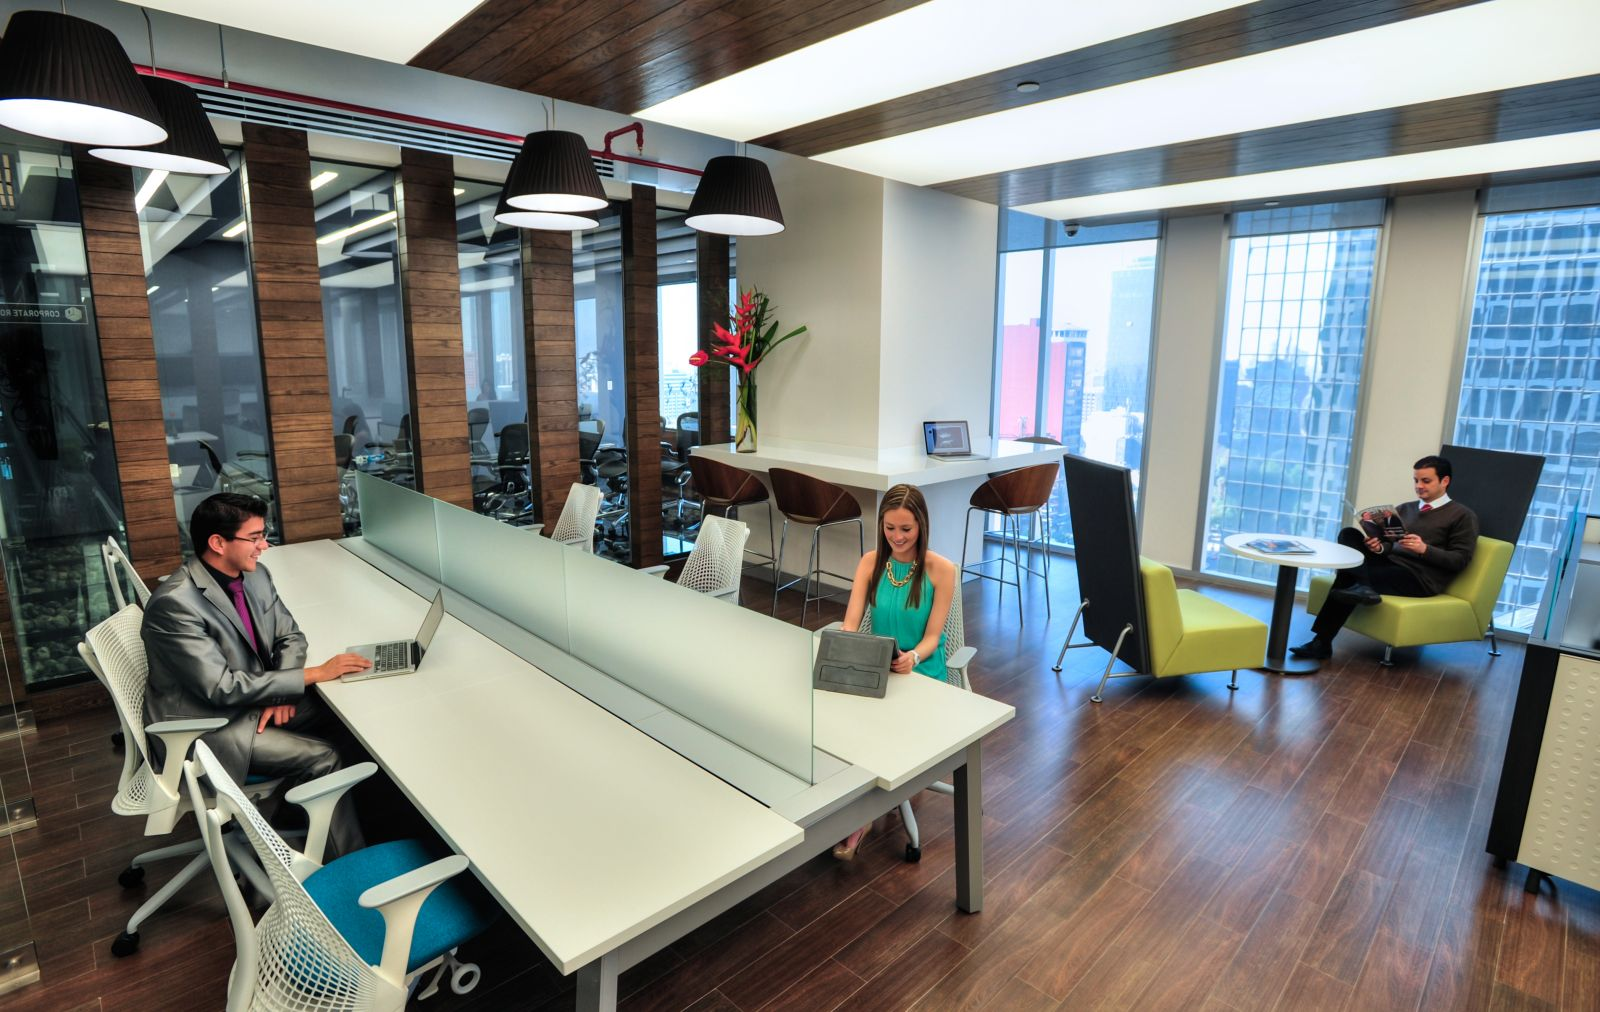 IOS OFFICES MAPFRE, Mexico City